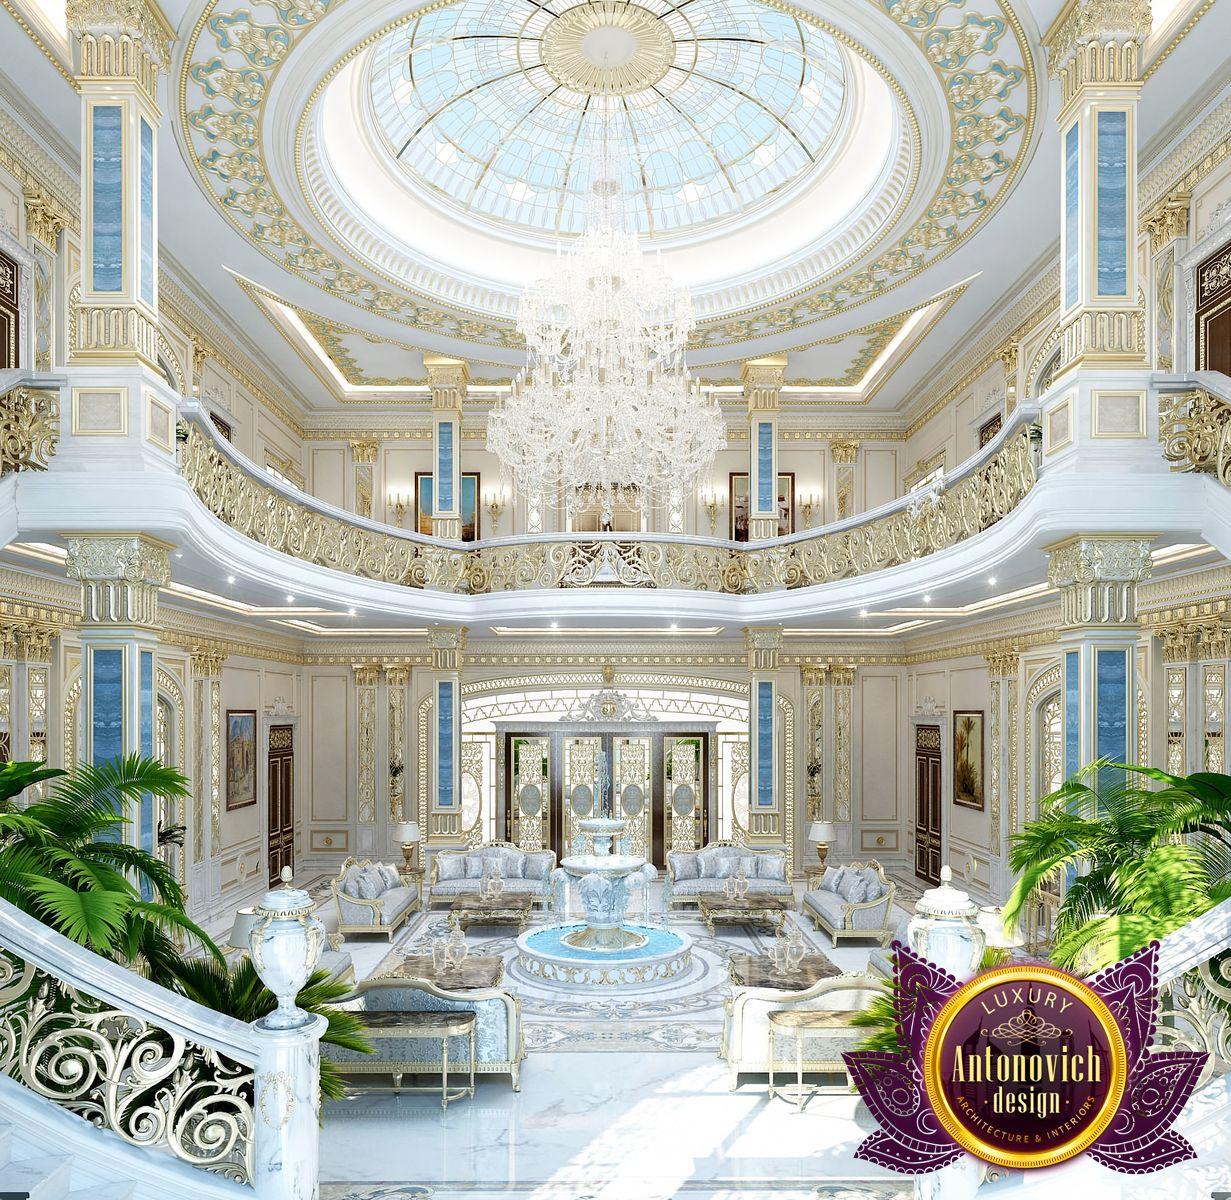 Katrina Antonovich Luxury Interior Design: Kenyadesign: The Best Interior Design Villa By Katrina